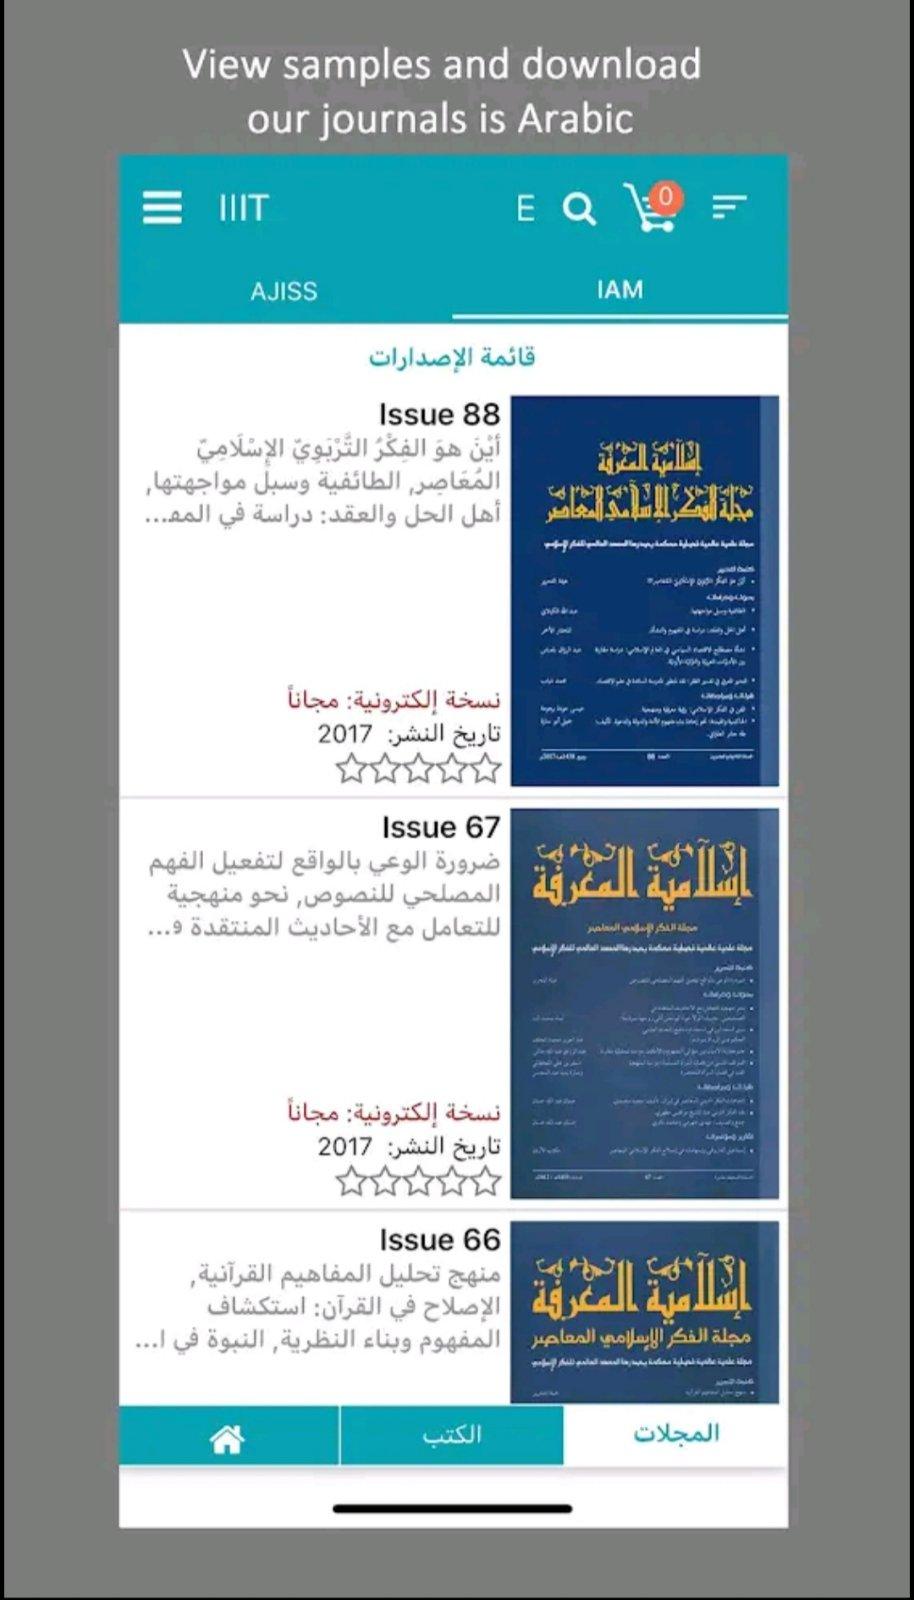 IIIT Books - Bilingual eBook Commerce Mobile App 3